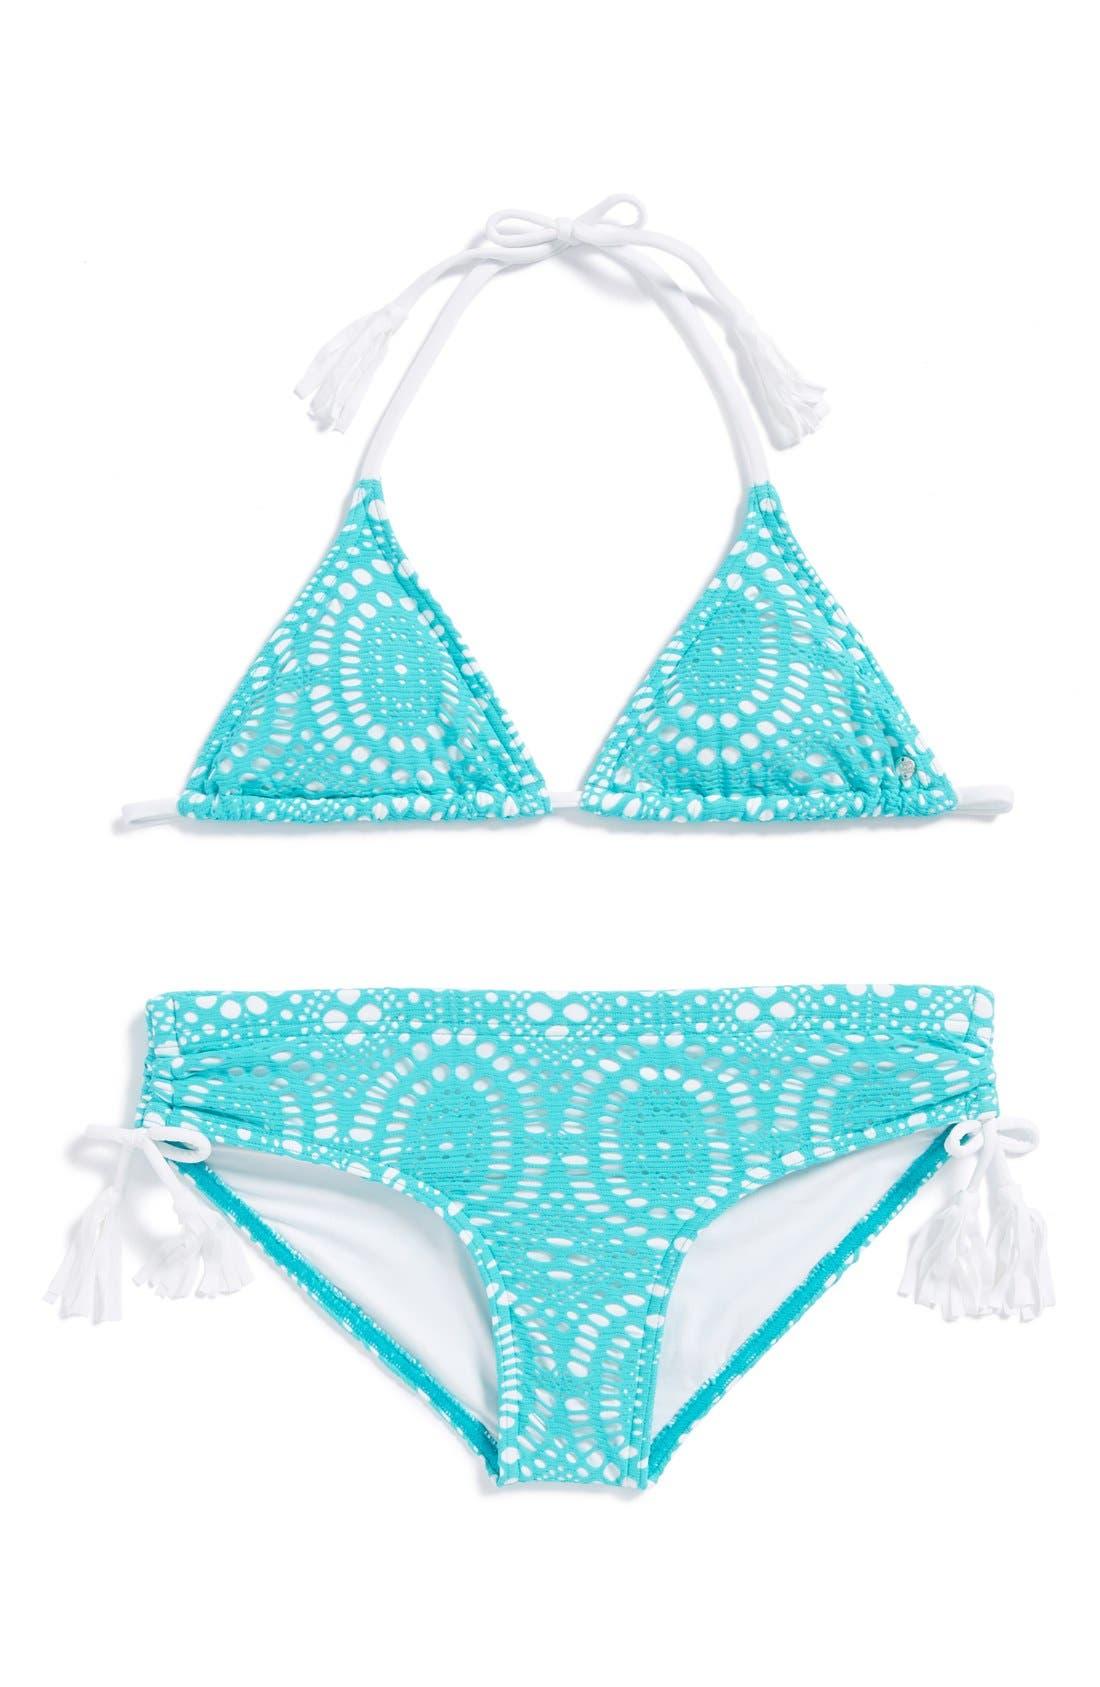 Alternate Image 1 Selected - Billabong Crochet Texture Triangle Bikini Two-Piece Swimsuit (Big Girls)